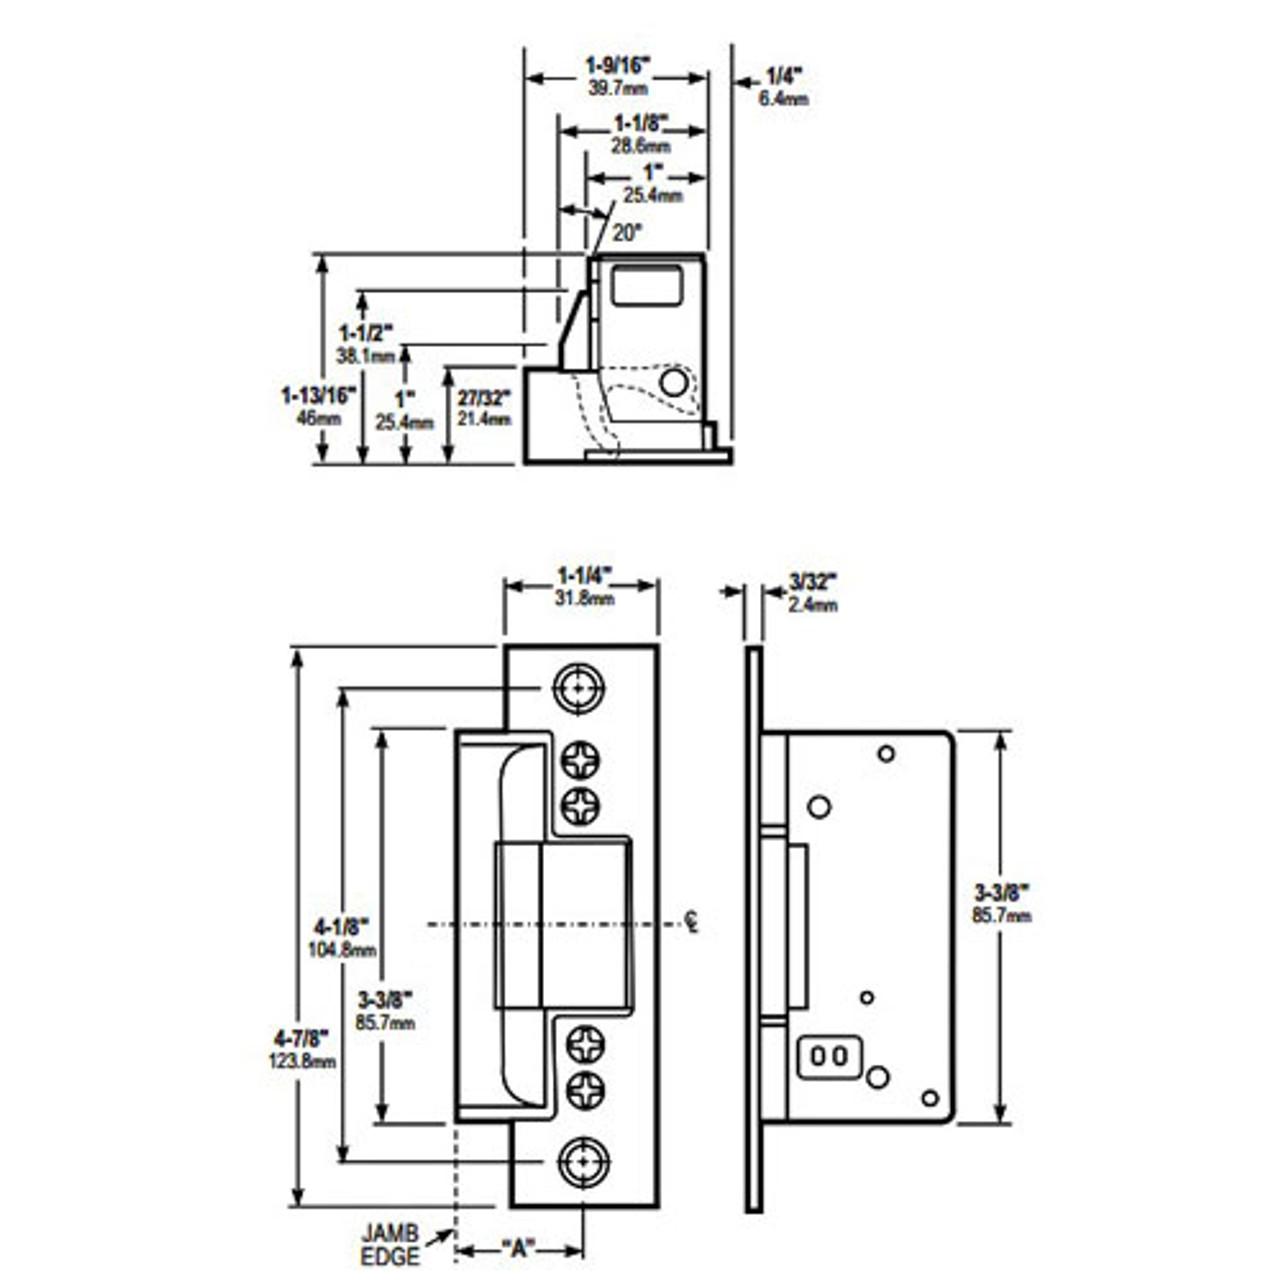 7170-545-313-50 Adams Rite Electric Strike Dimensional View